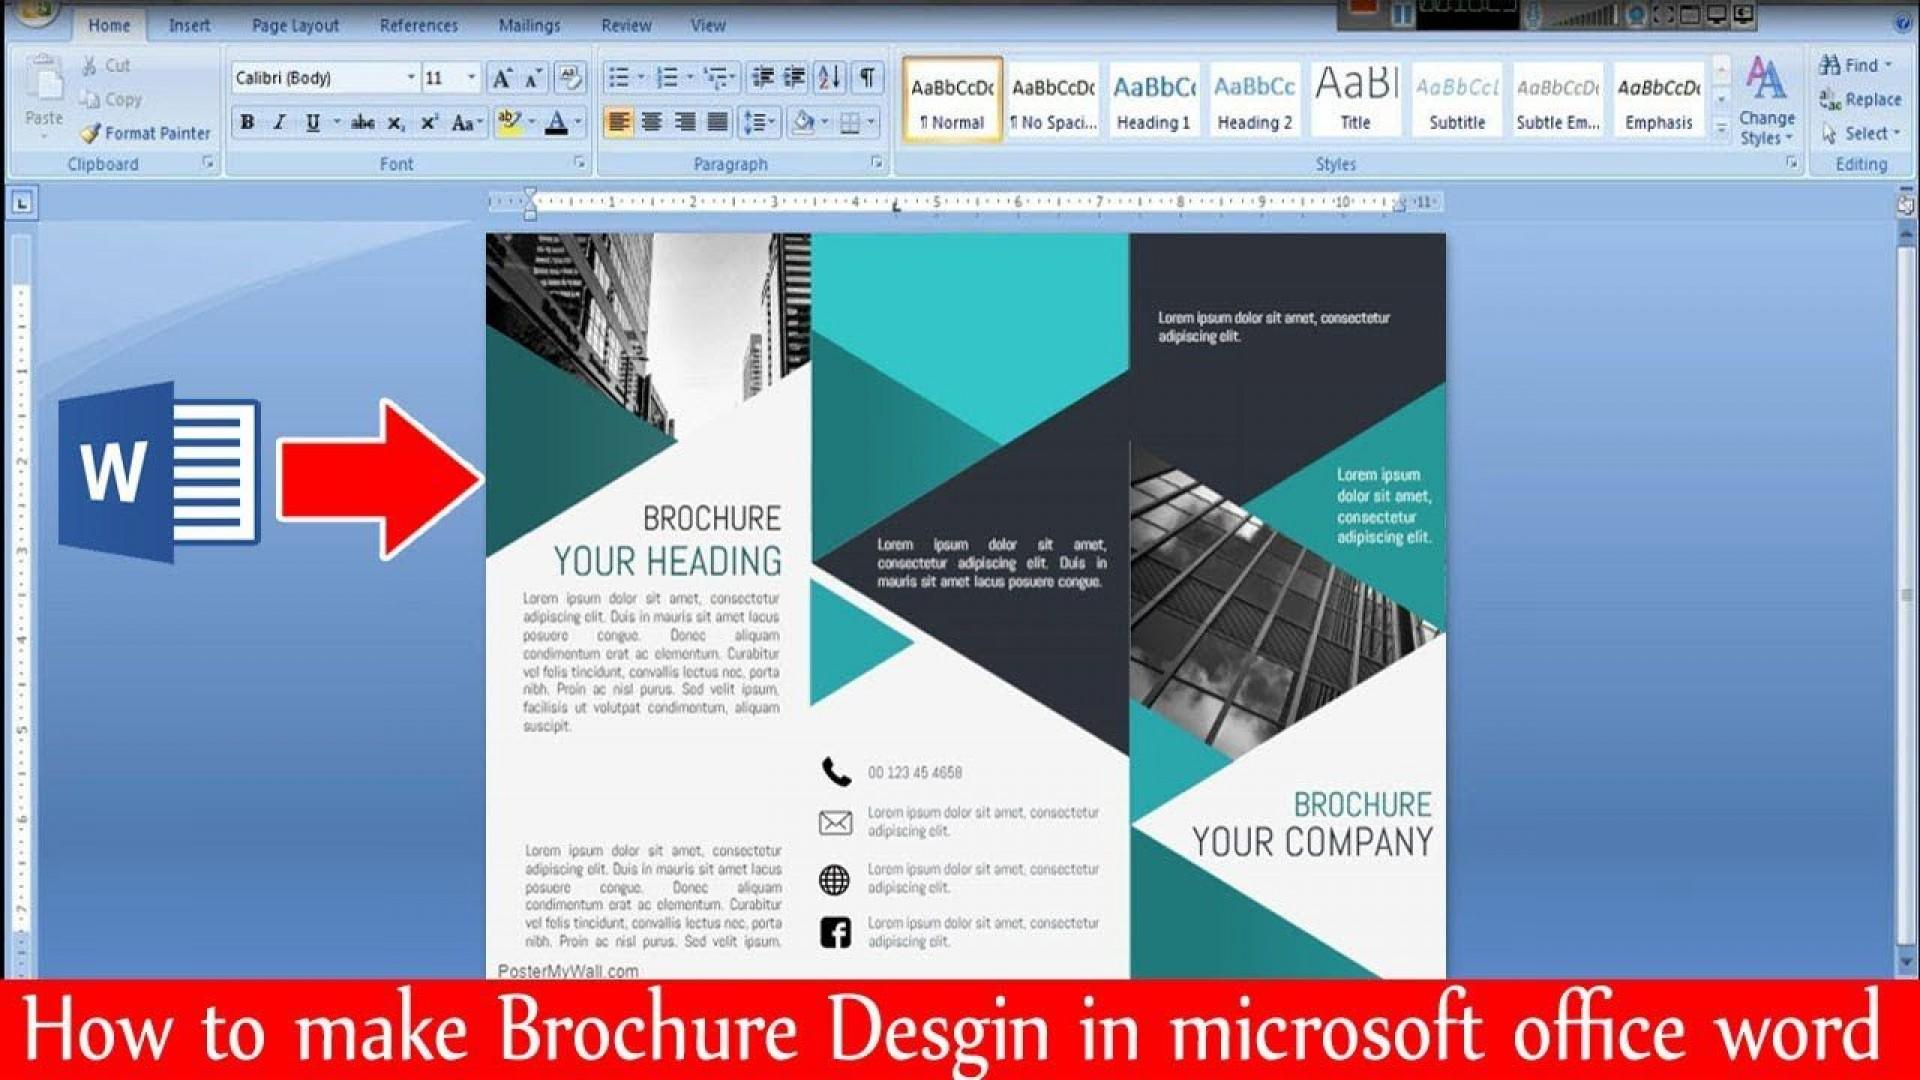 000 Surprising Microsoft Word Brochure Format High Def  2007 Flyer Template 3 Fold1920